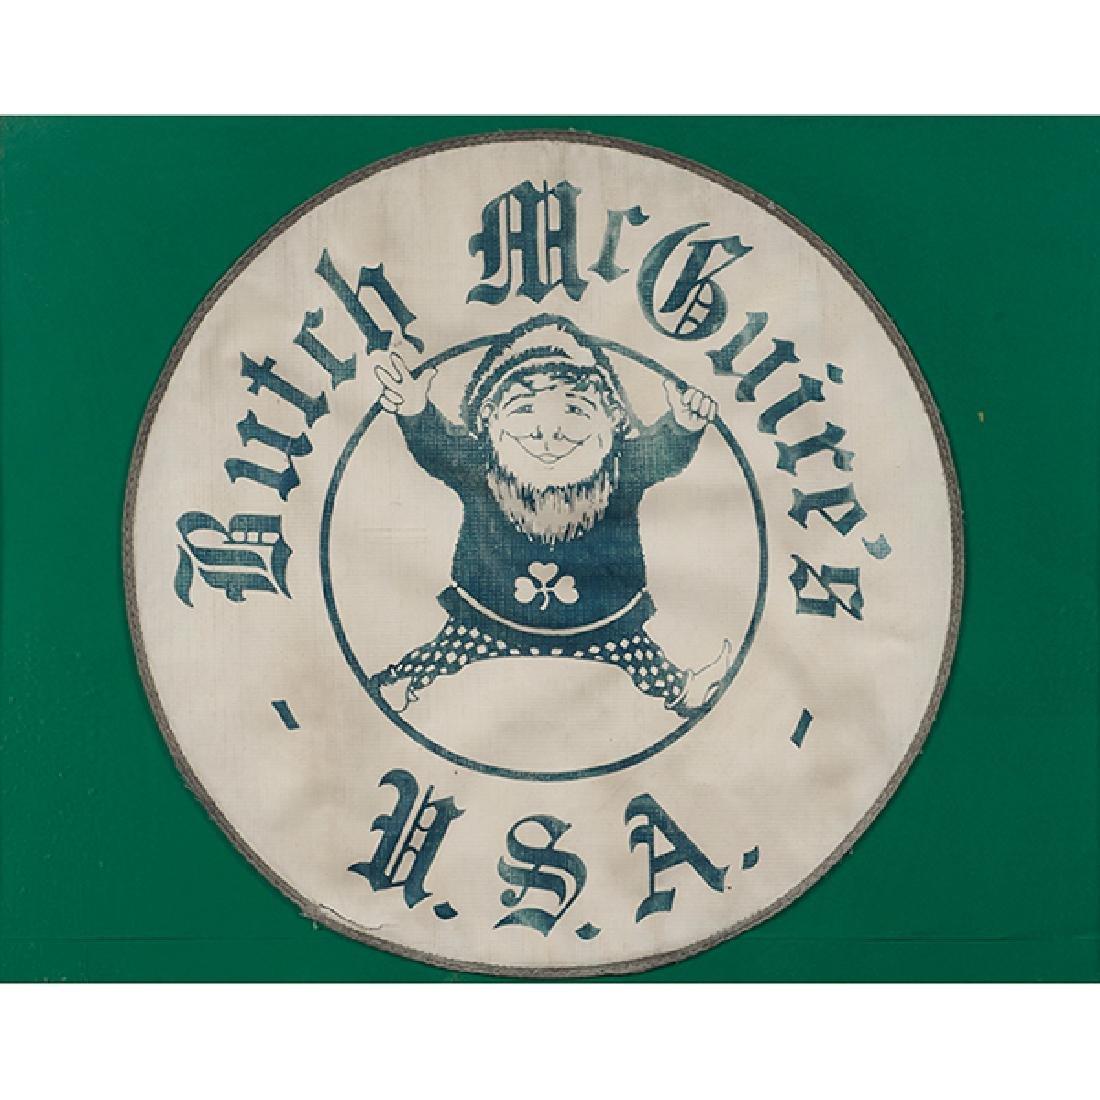 Butch McGuire's, framed logo, print on canvas, 20